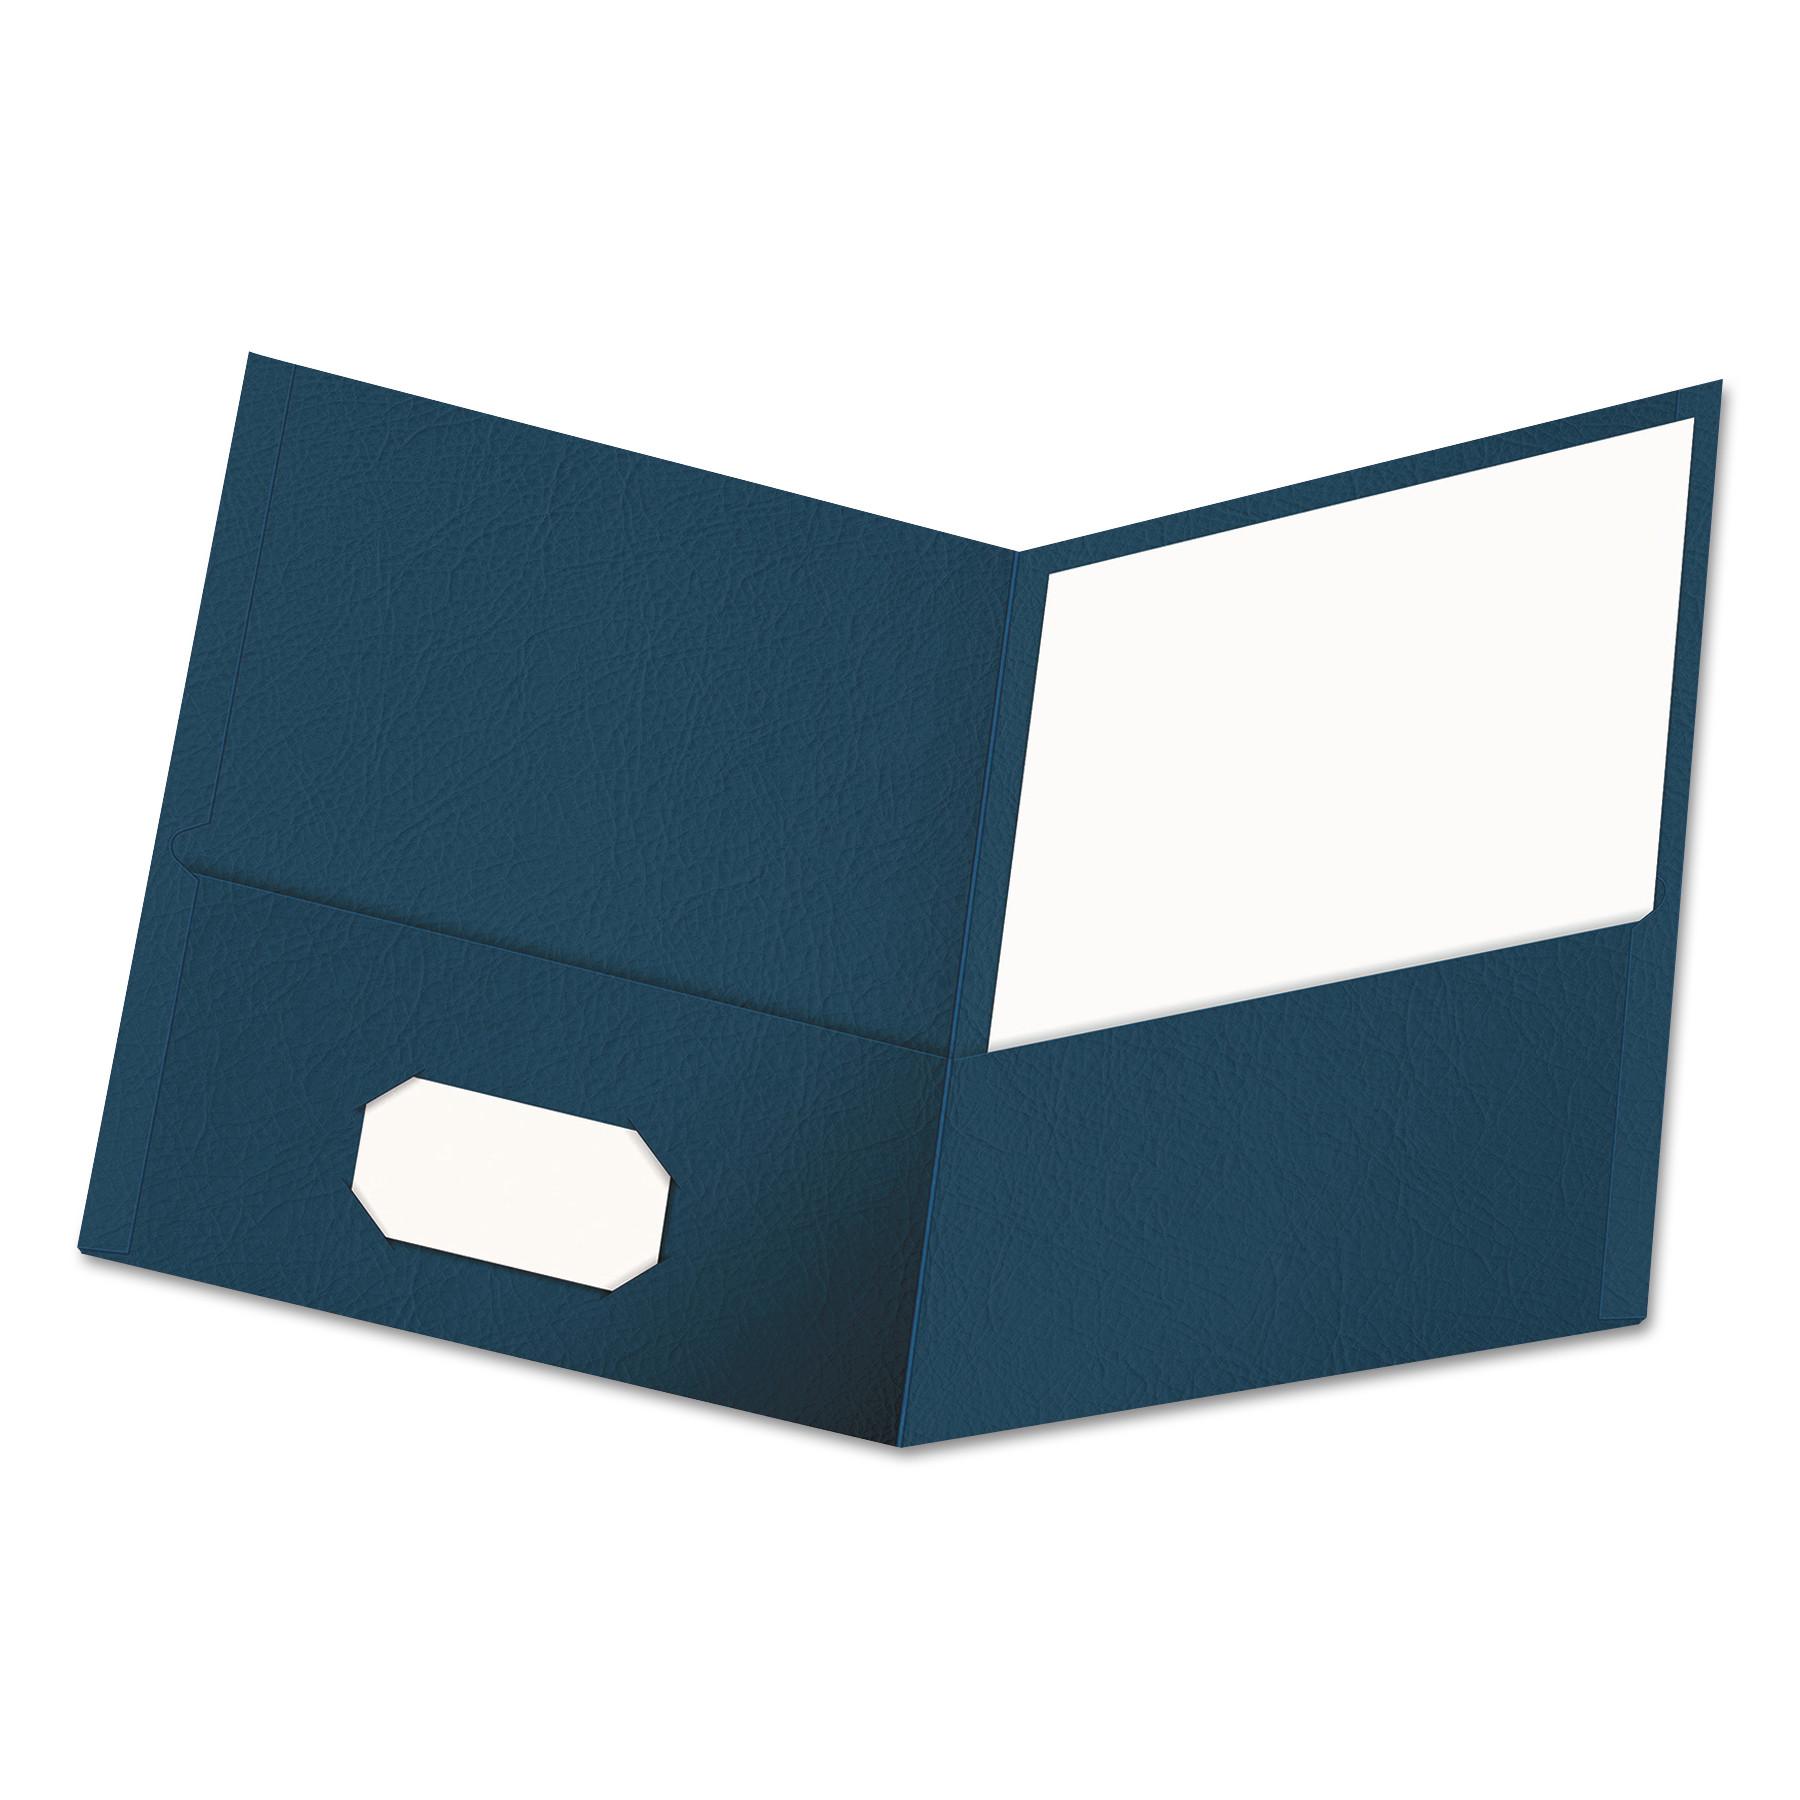 Two-Pocket Portfolio, Embossed Leather Grain Paper, Dark Blue, 25/Box